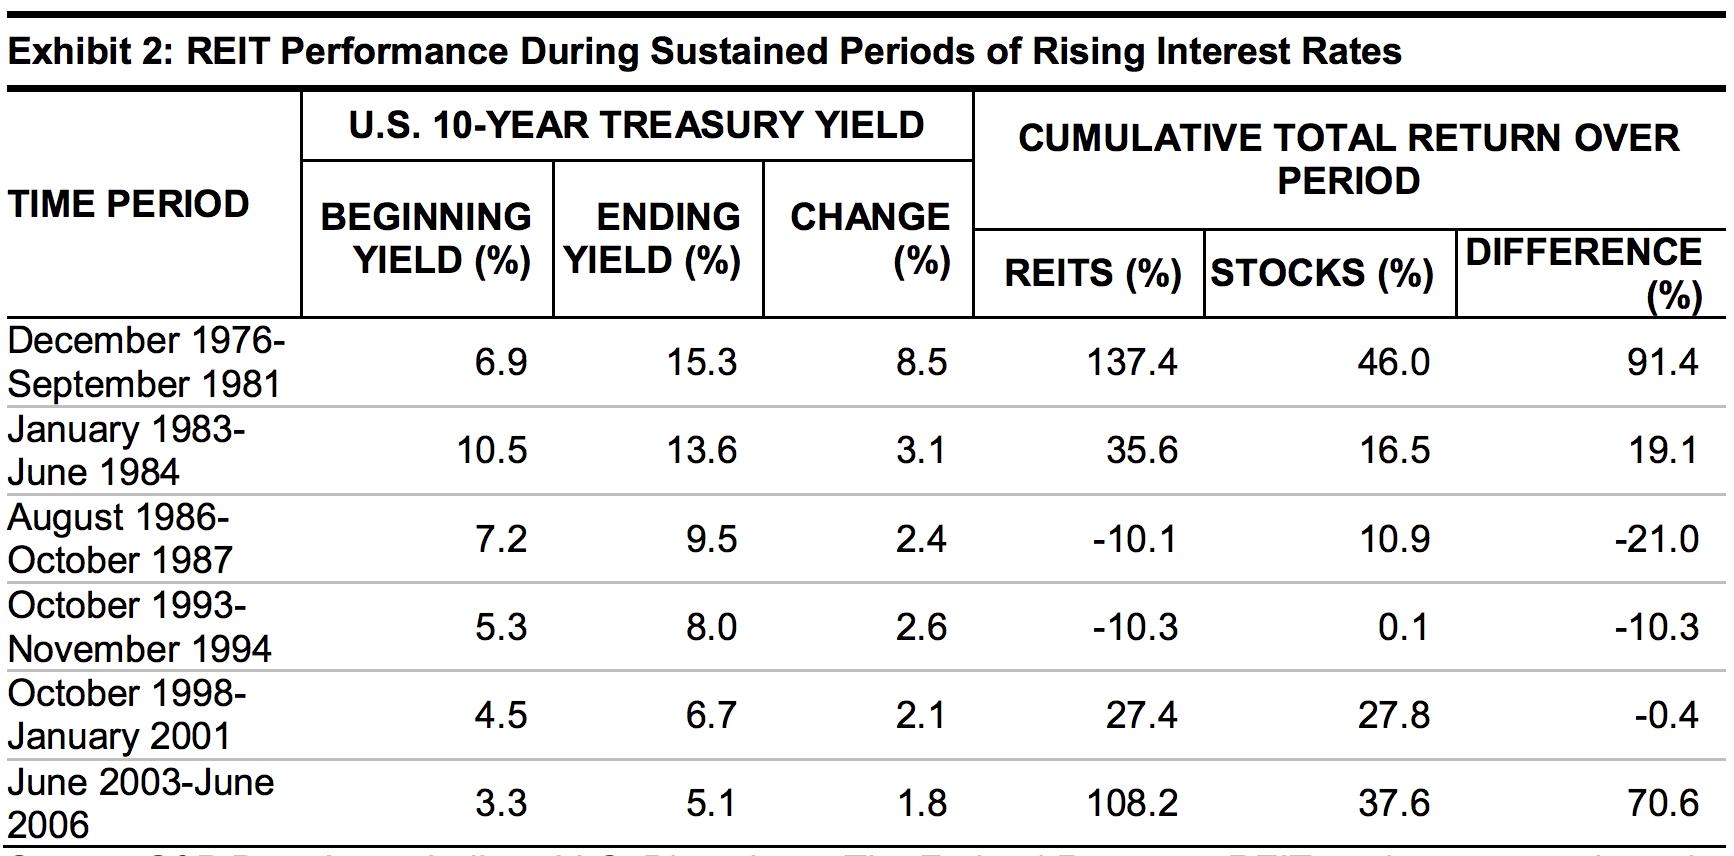 REIT & Stock Performance